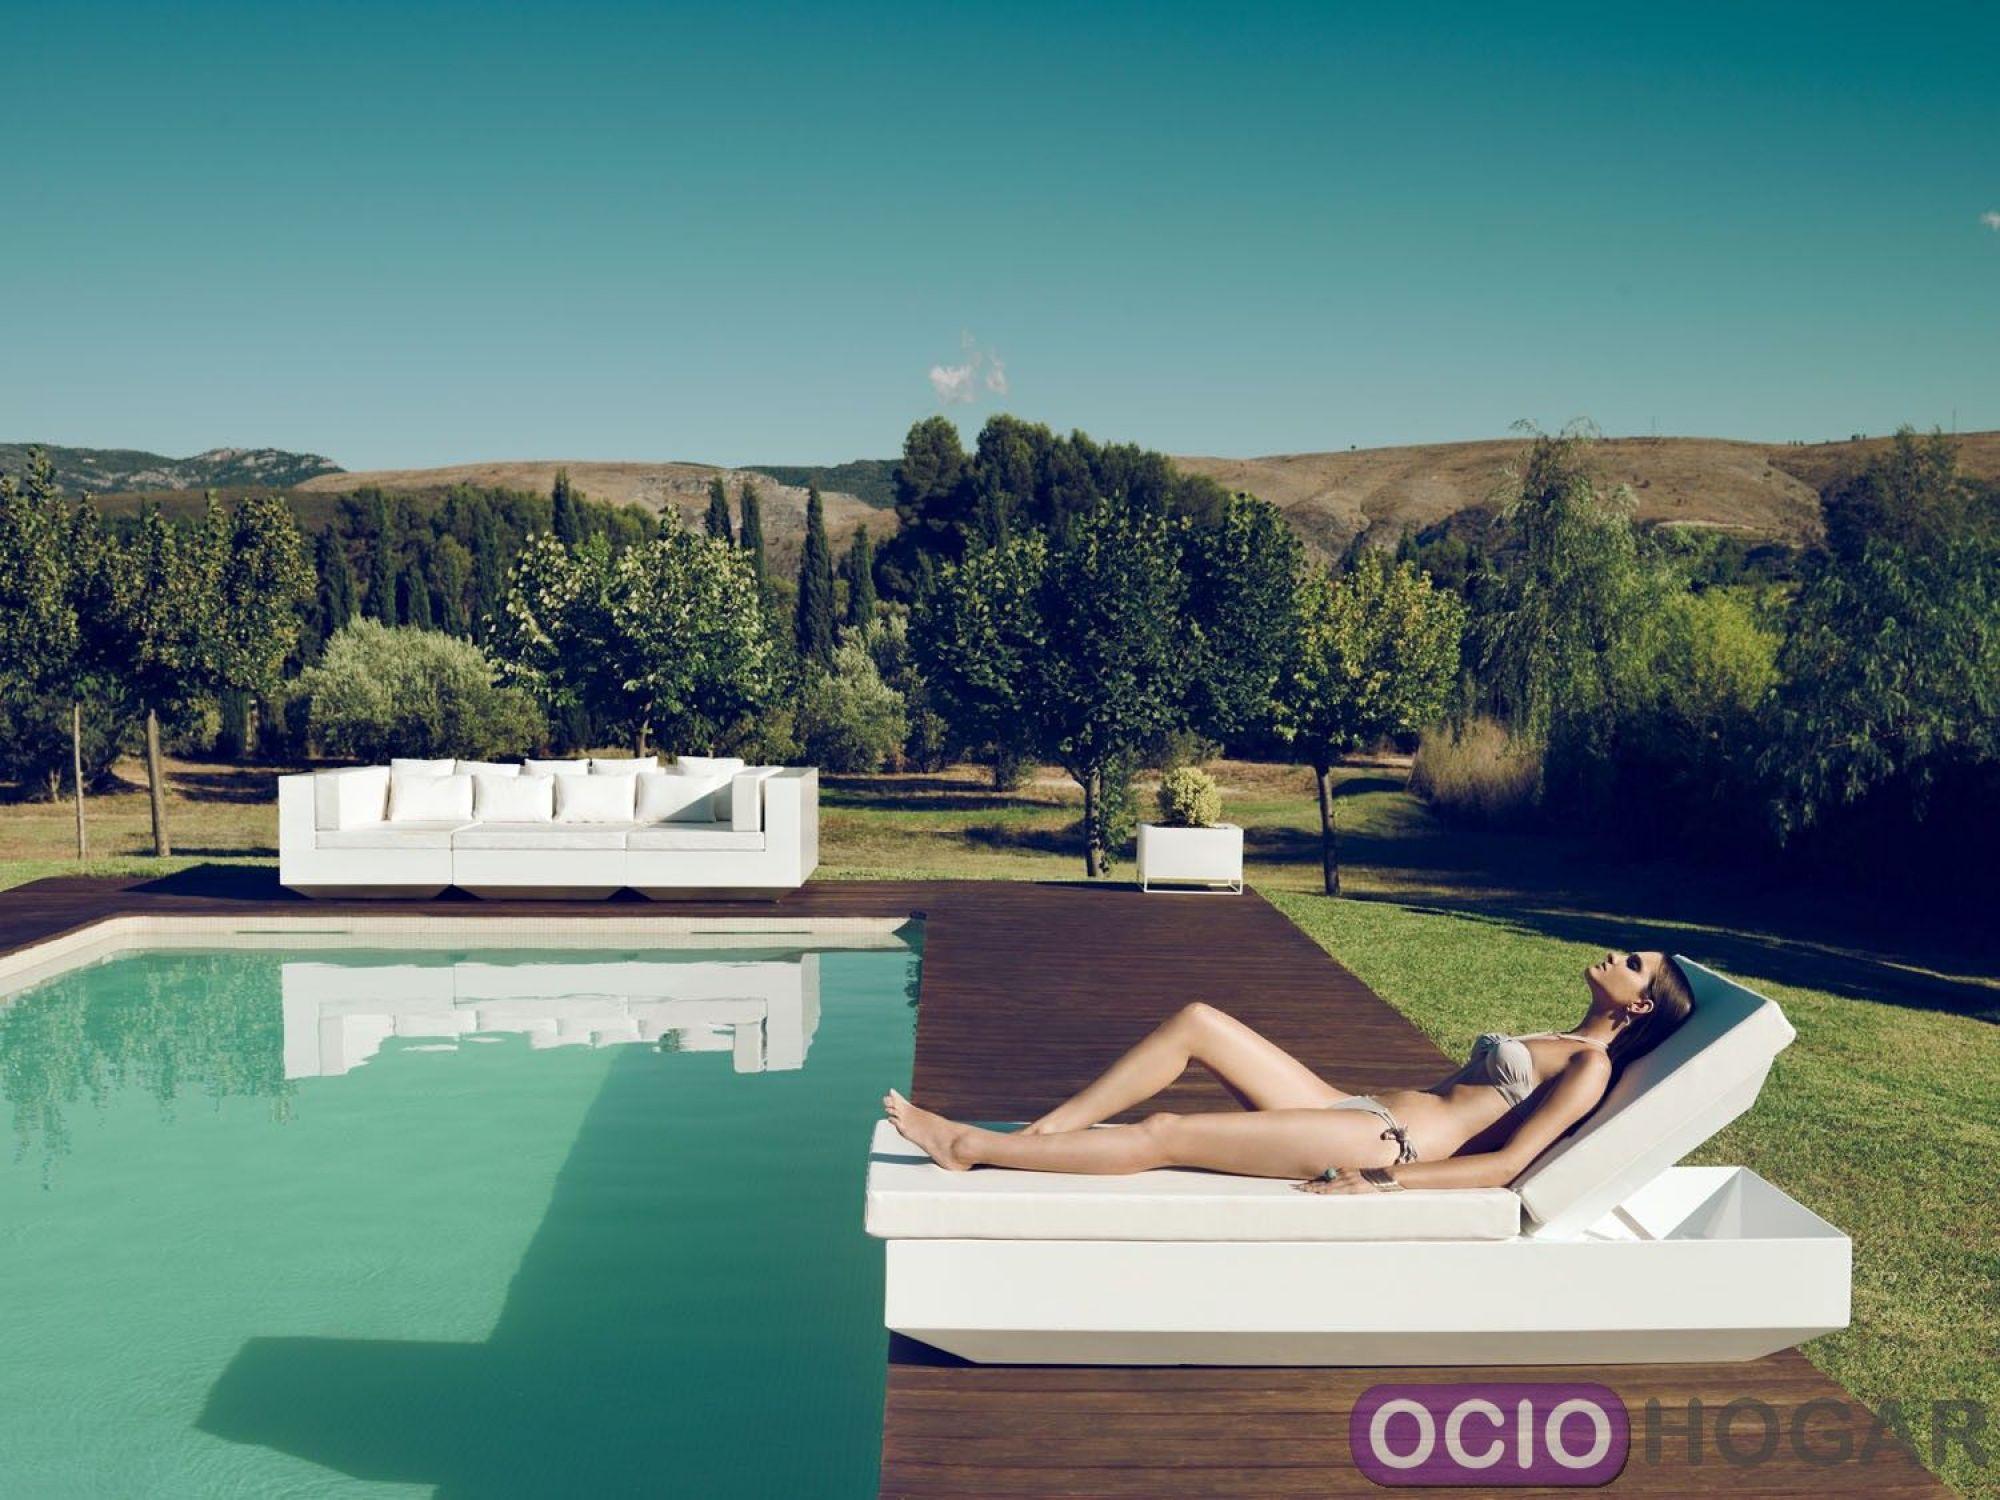 Tumbona y mesita vela de vondom - Jardines con piscinas fotos ...